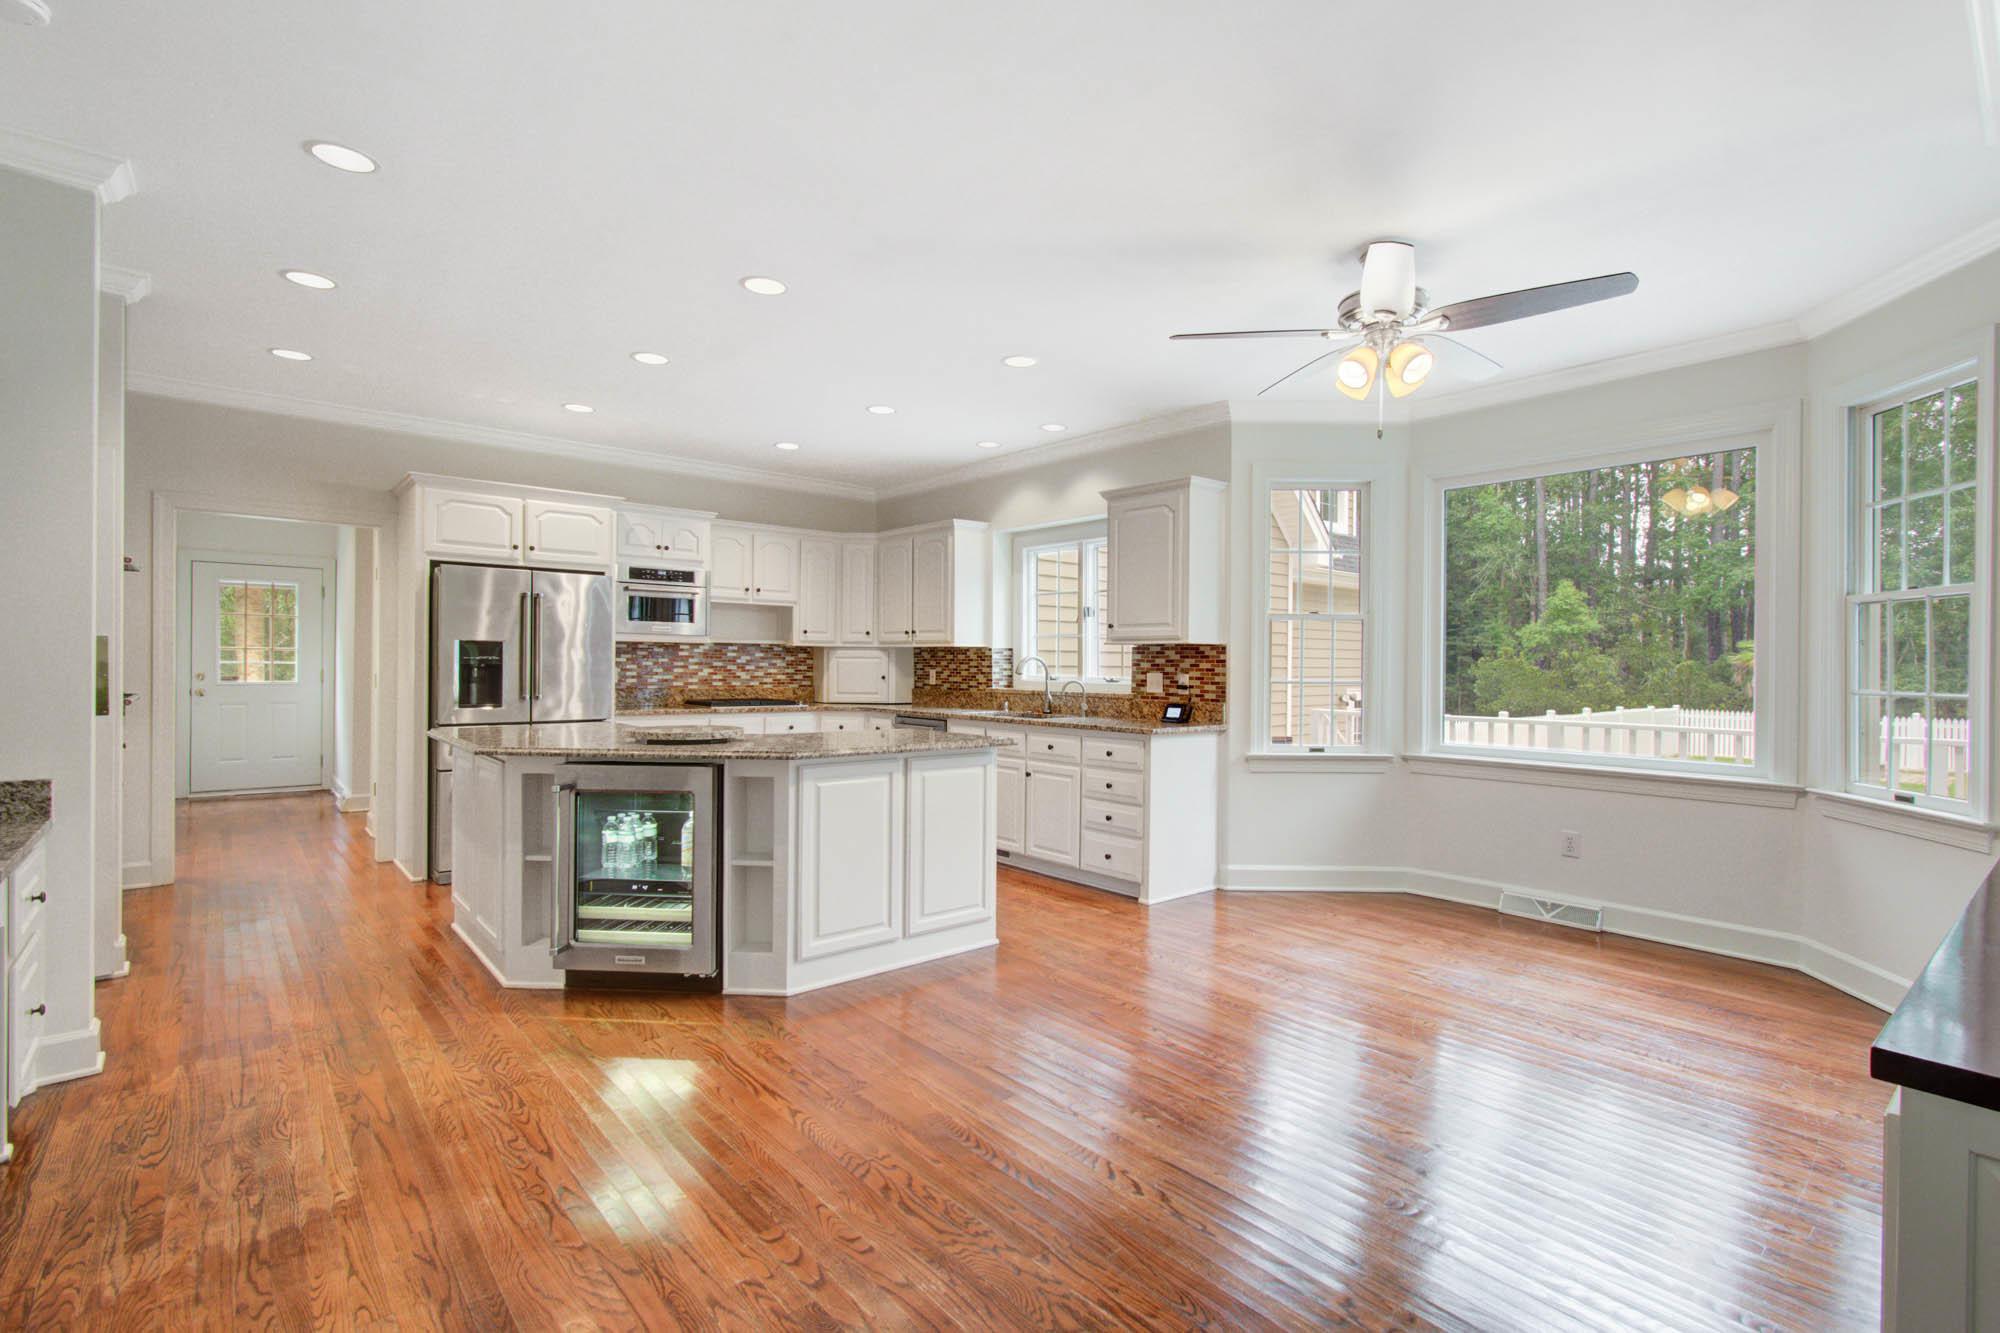 Dunes West Homes For Sale - 3515 Colonel Vanderhorst, Mount Pleasant, SC - 44